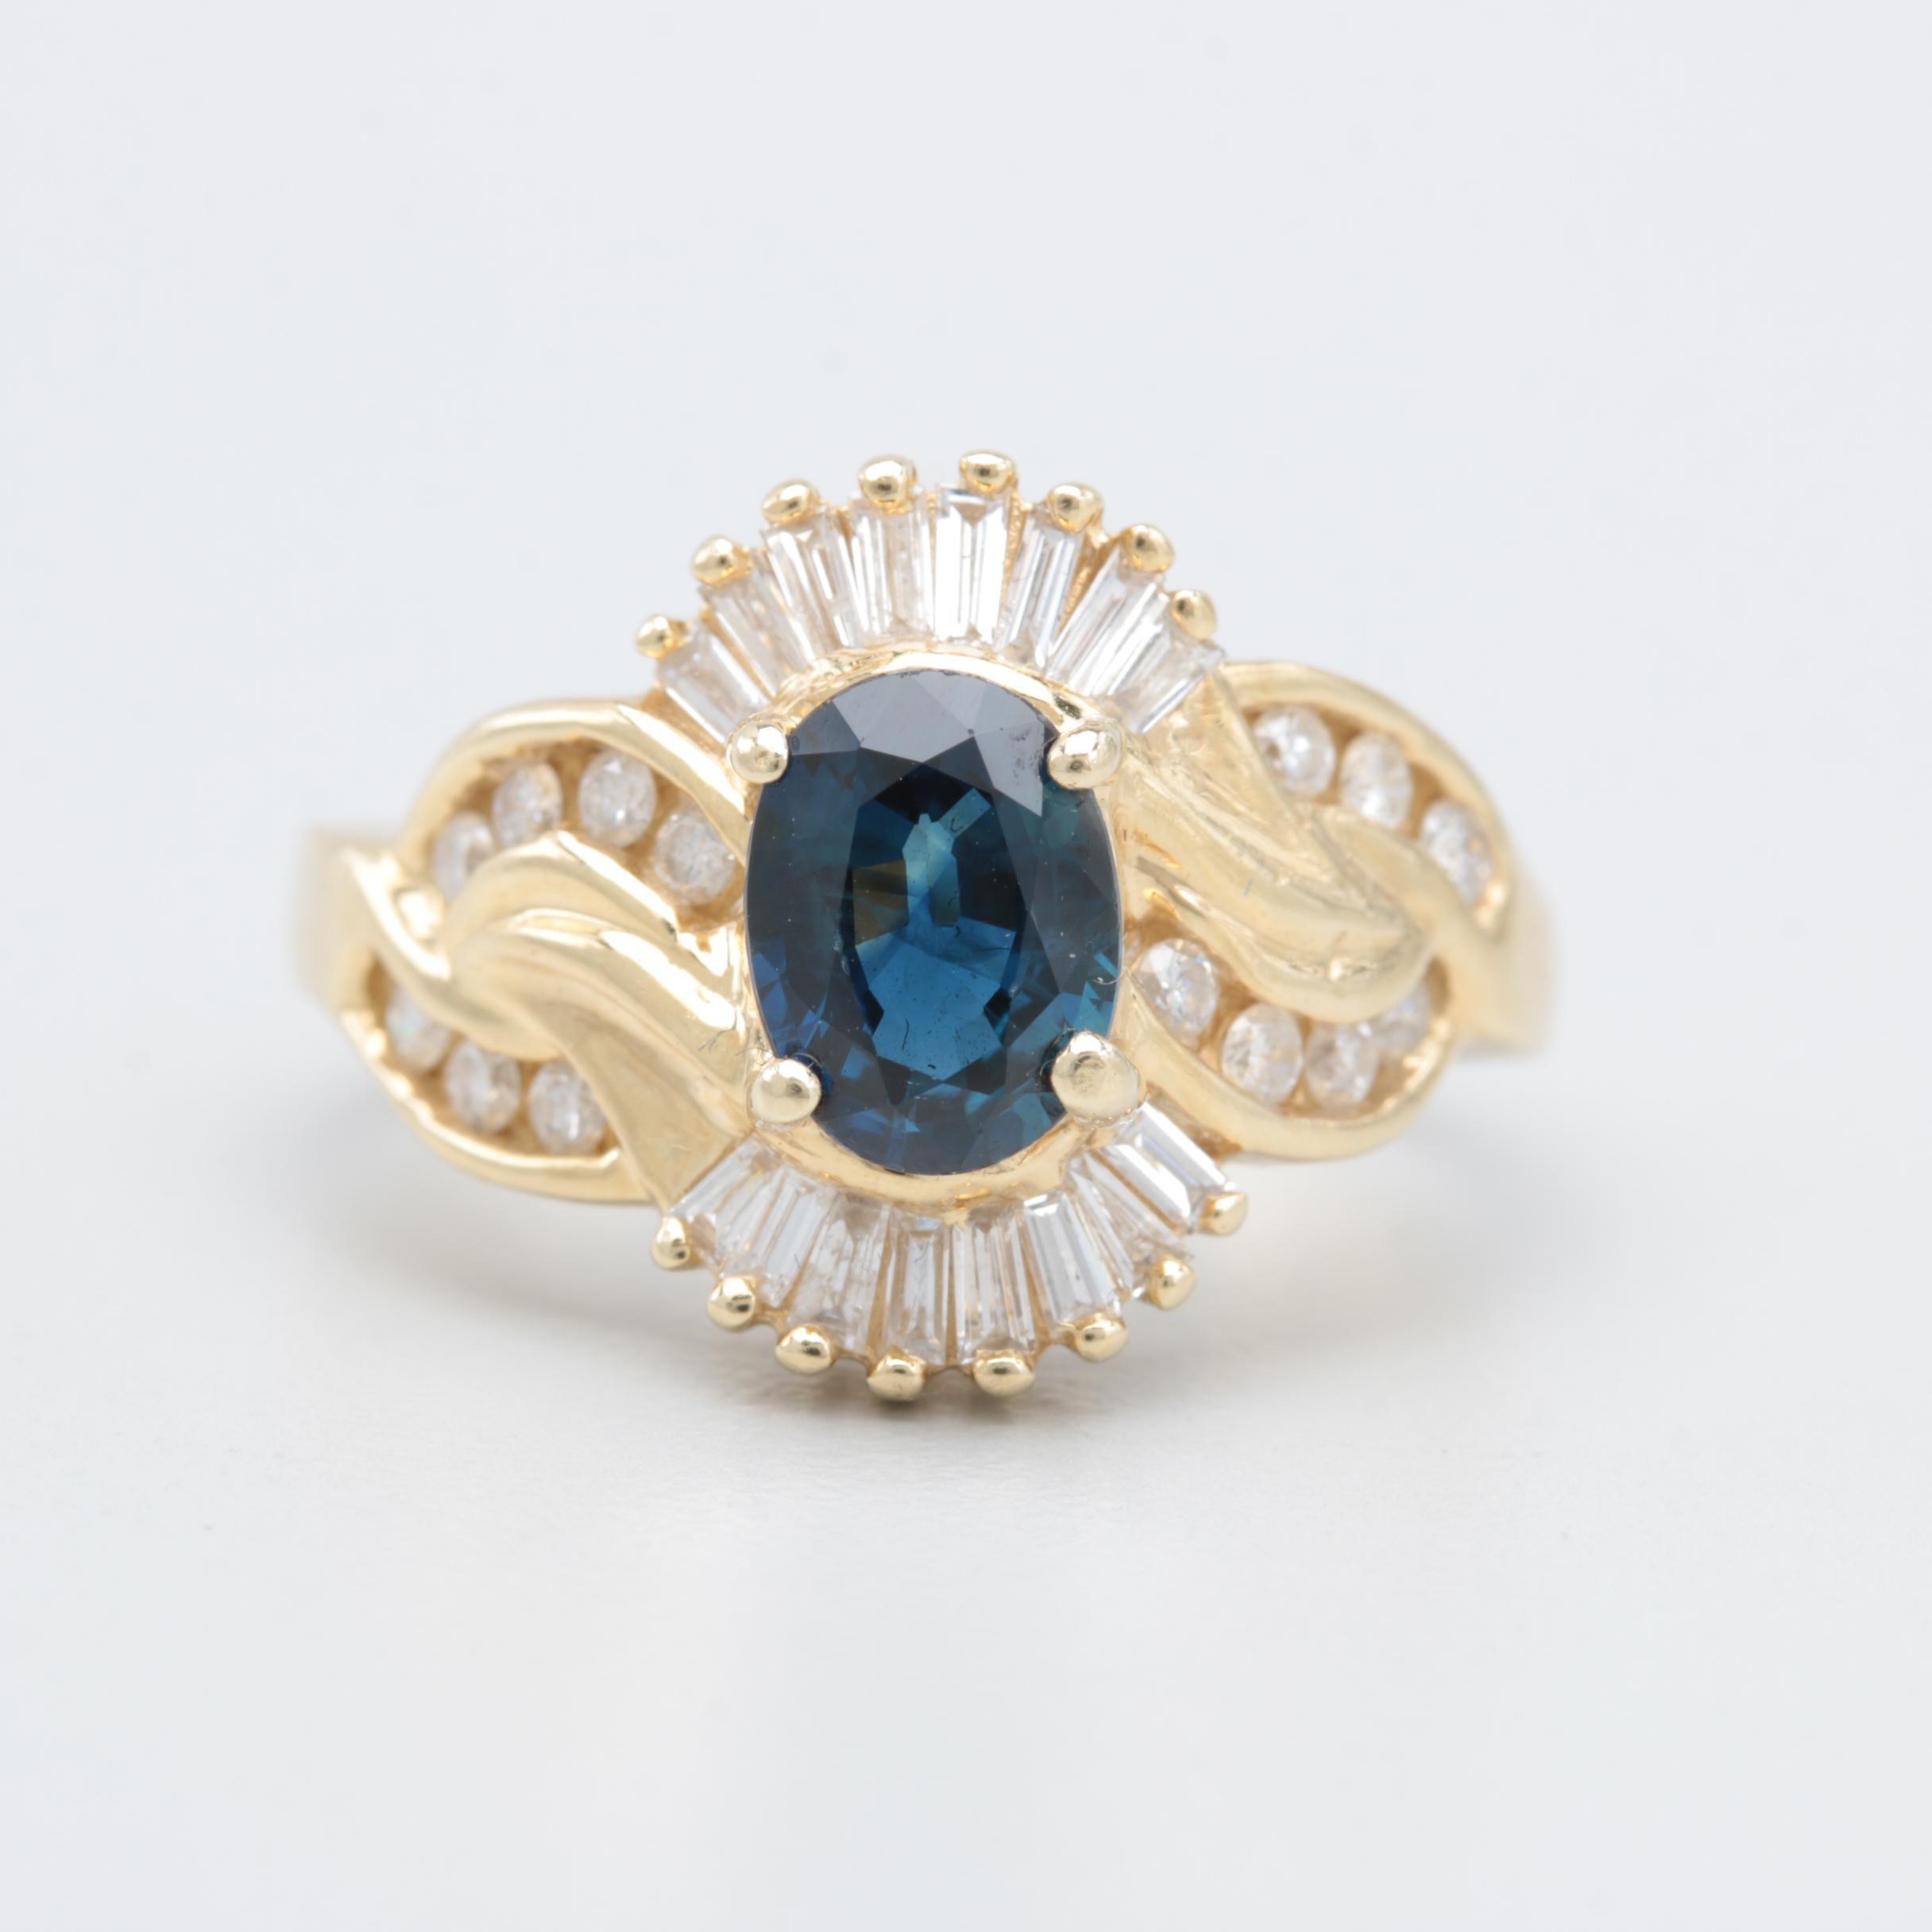 Vintage Abraham David Lowenstark 14K Yellow Gold Sapphire and Diamond Ring